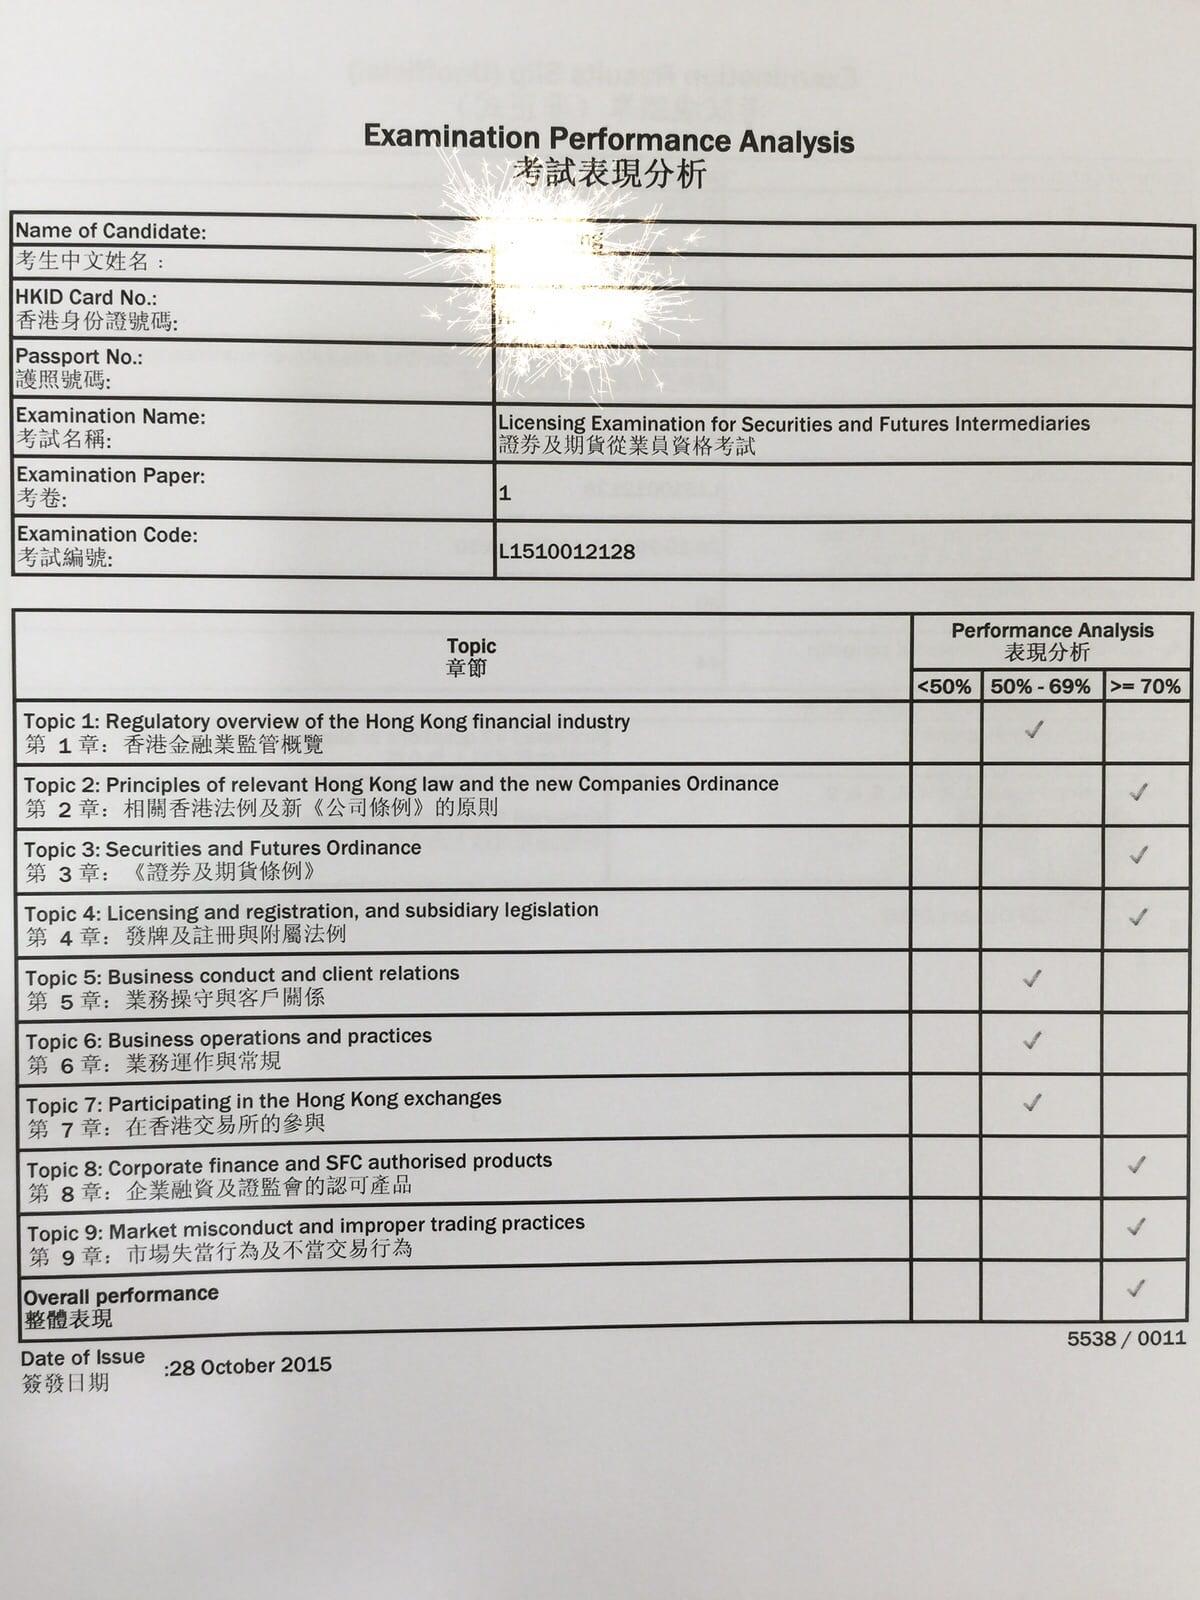 Simonje 28/10/2015 LE Paper 1 證券期貨從業員資格考試卷一 Pass